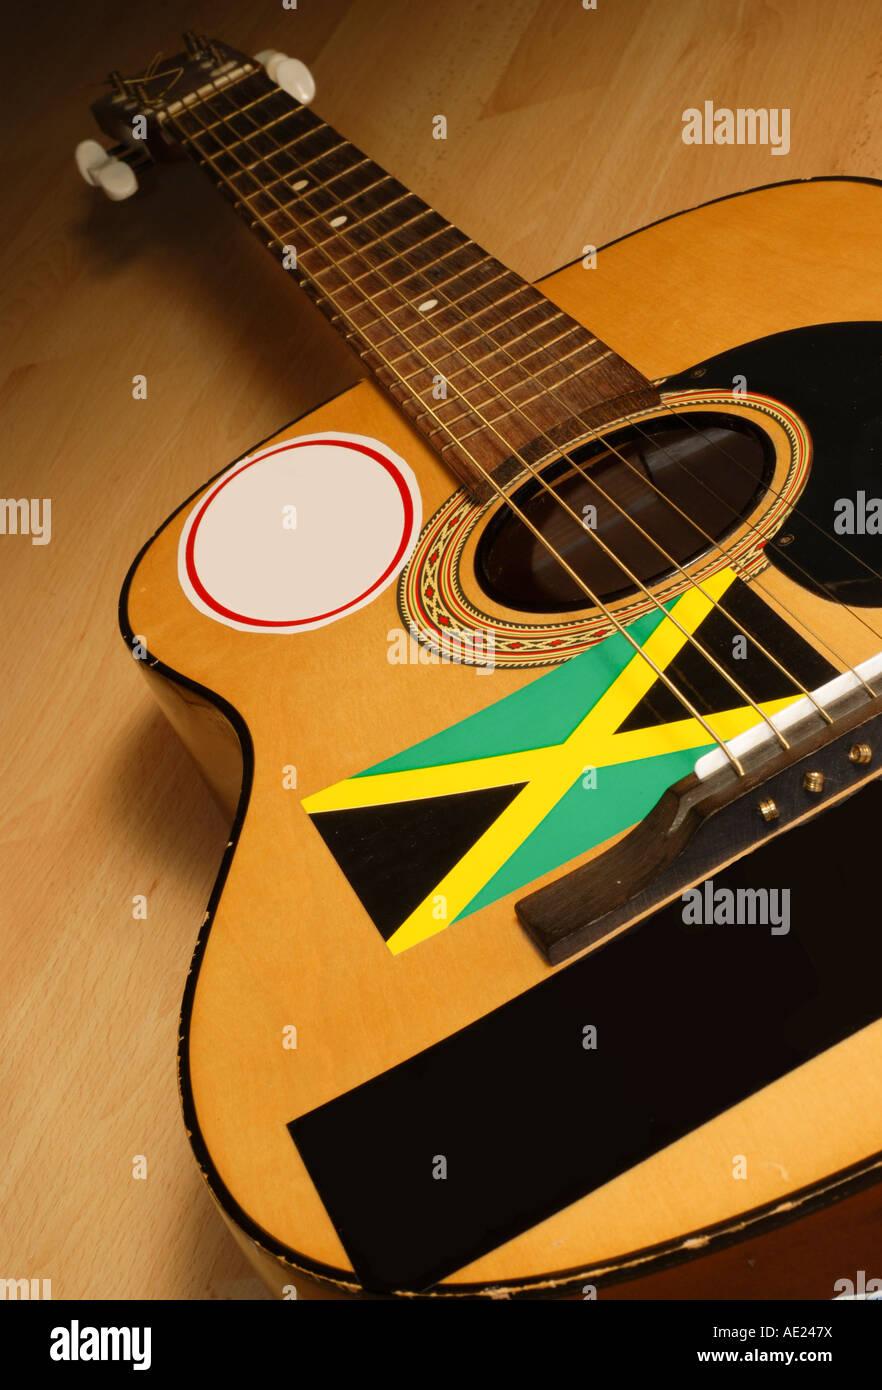 Jamaican  reggae rasta guitar - Jamaica - Stock Image